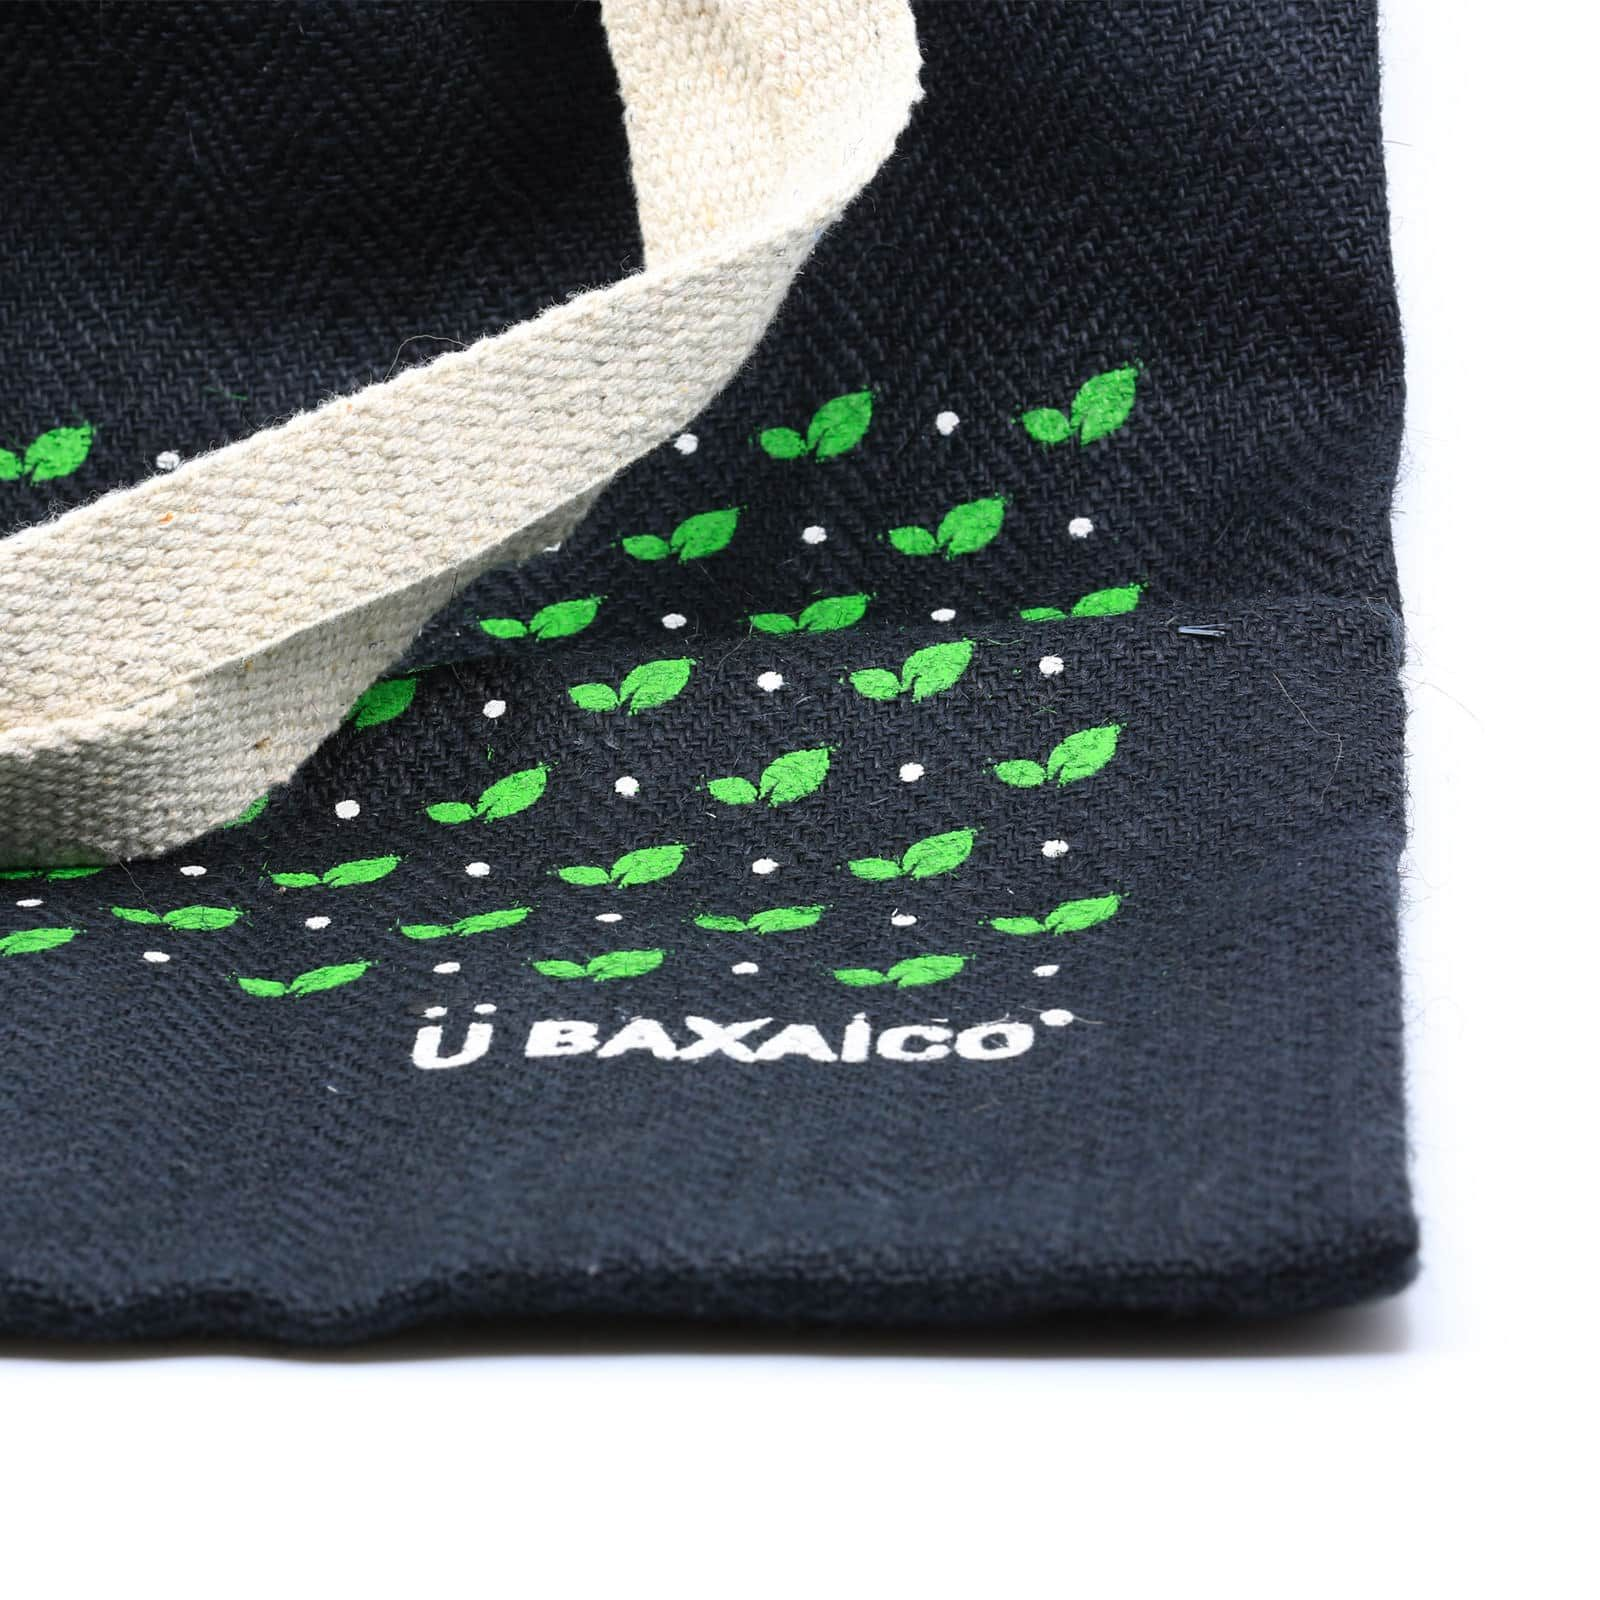 Jute Bag Ü Baxaico